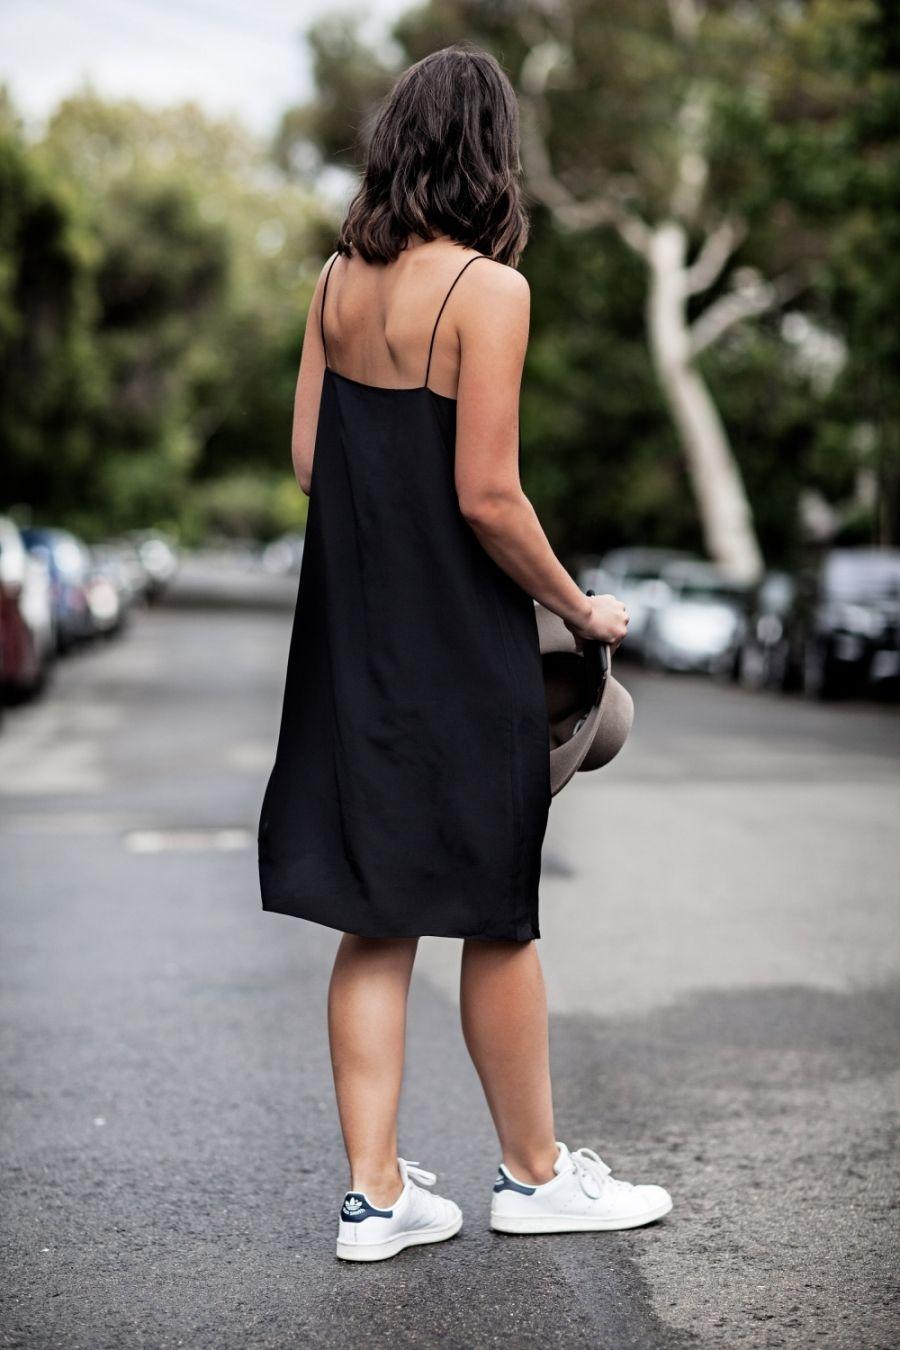 30 Ways To Wear Your Go To Black Dress All Summer Slip Dress Street Style Street Style Dress Fashion [ 1350 x 900 Pixel ]